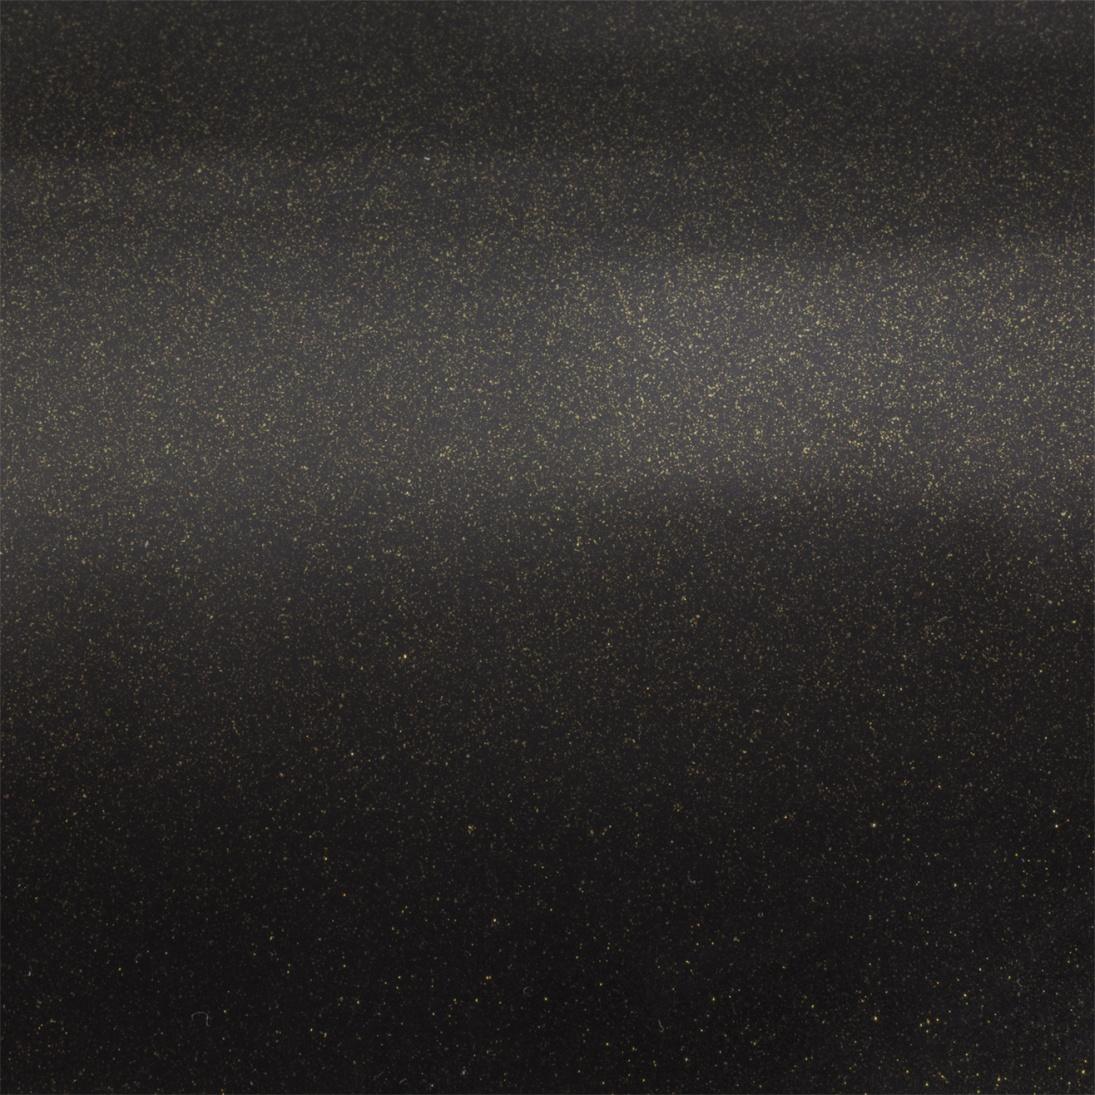 1080 sp242-satin-gold-dust-black-3M